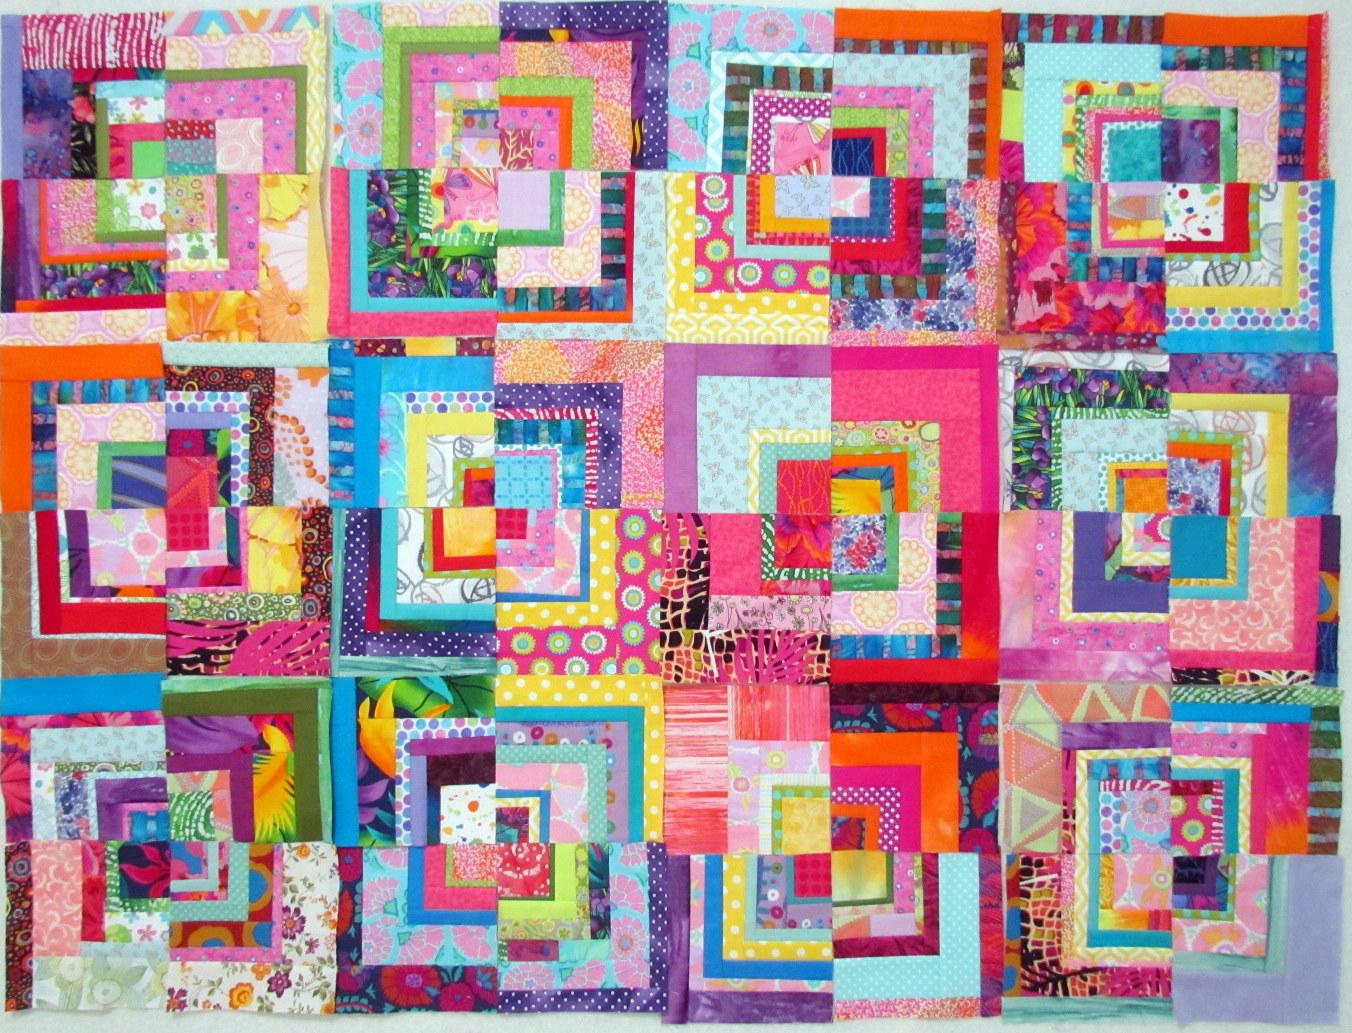 57f74bf695eec Melody Johnson: Choosing a Setting